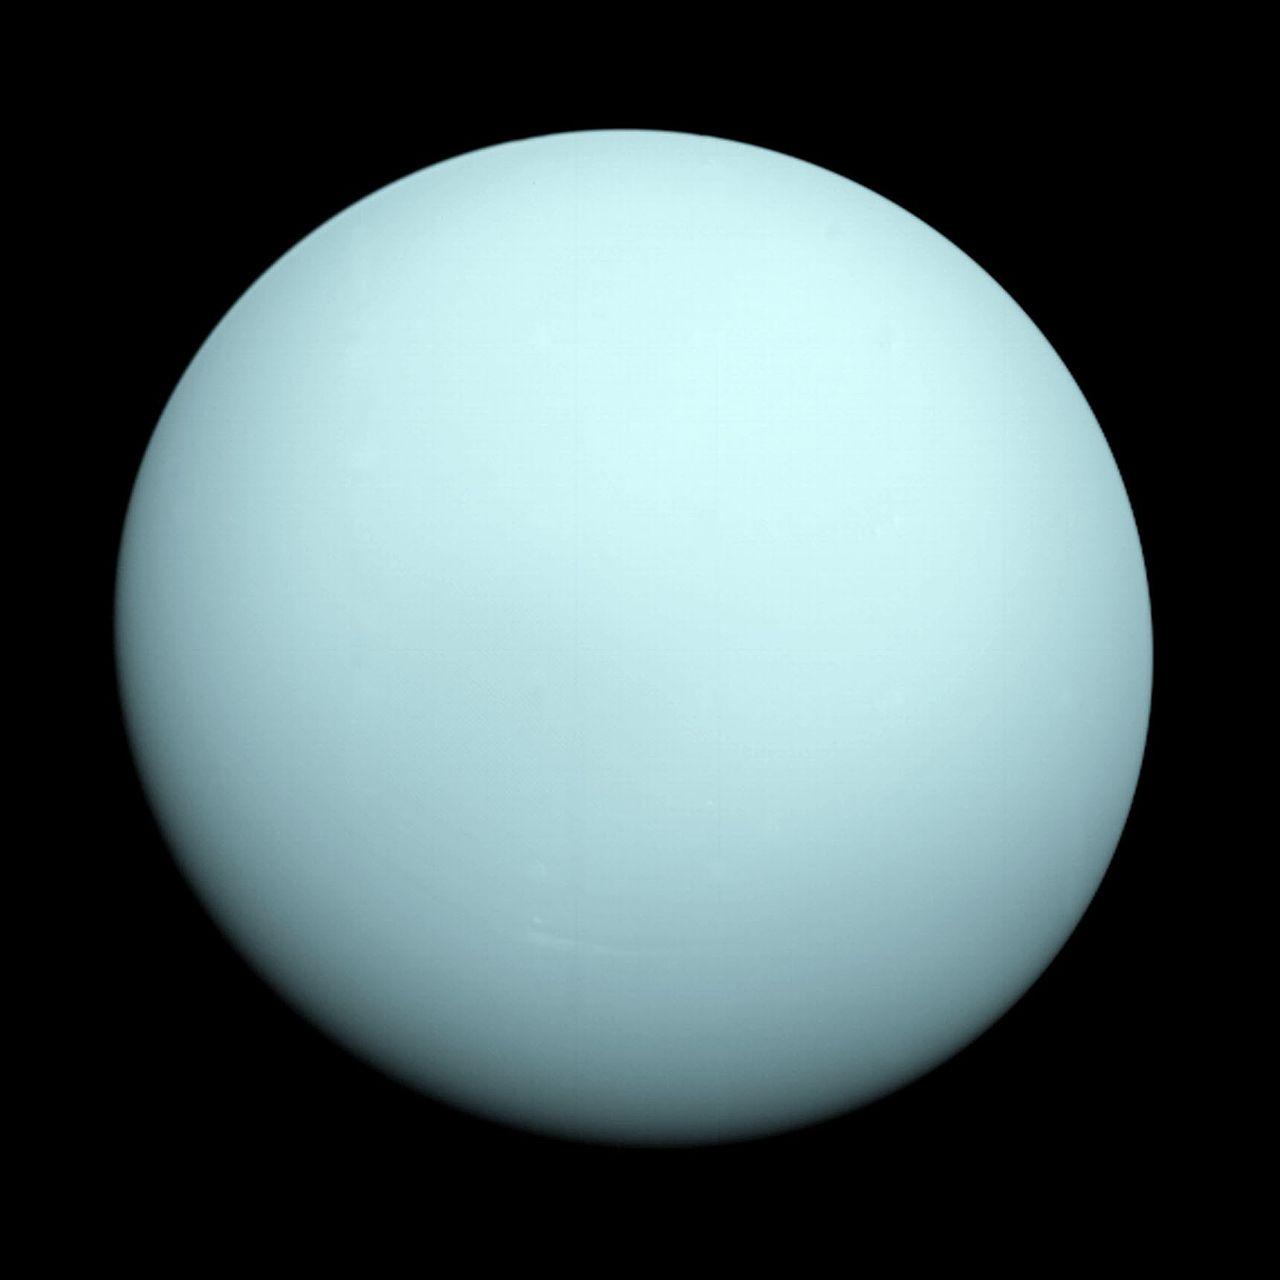 Image of Gas Giant Planet Uranus.